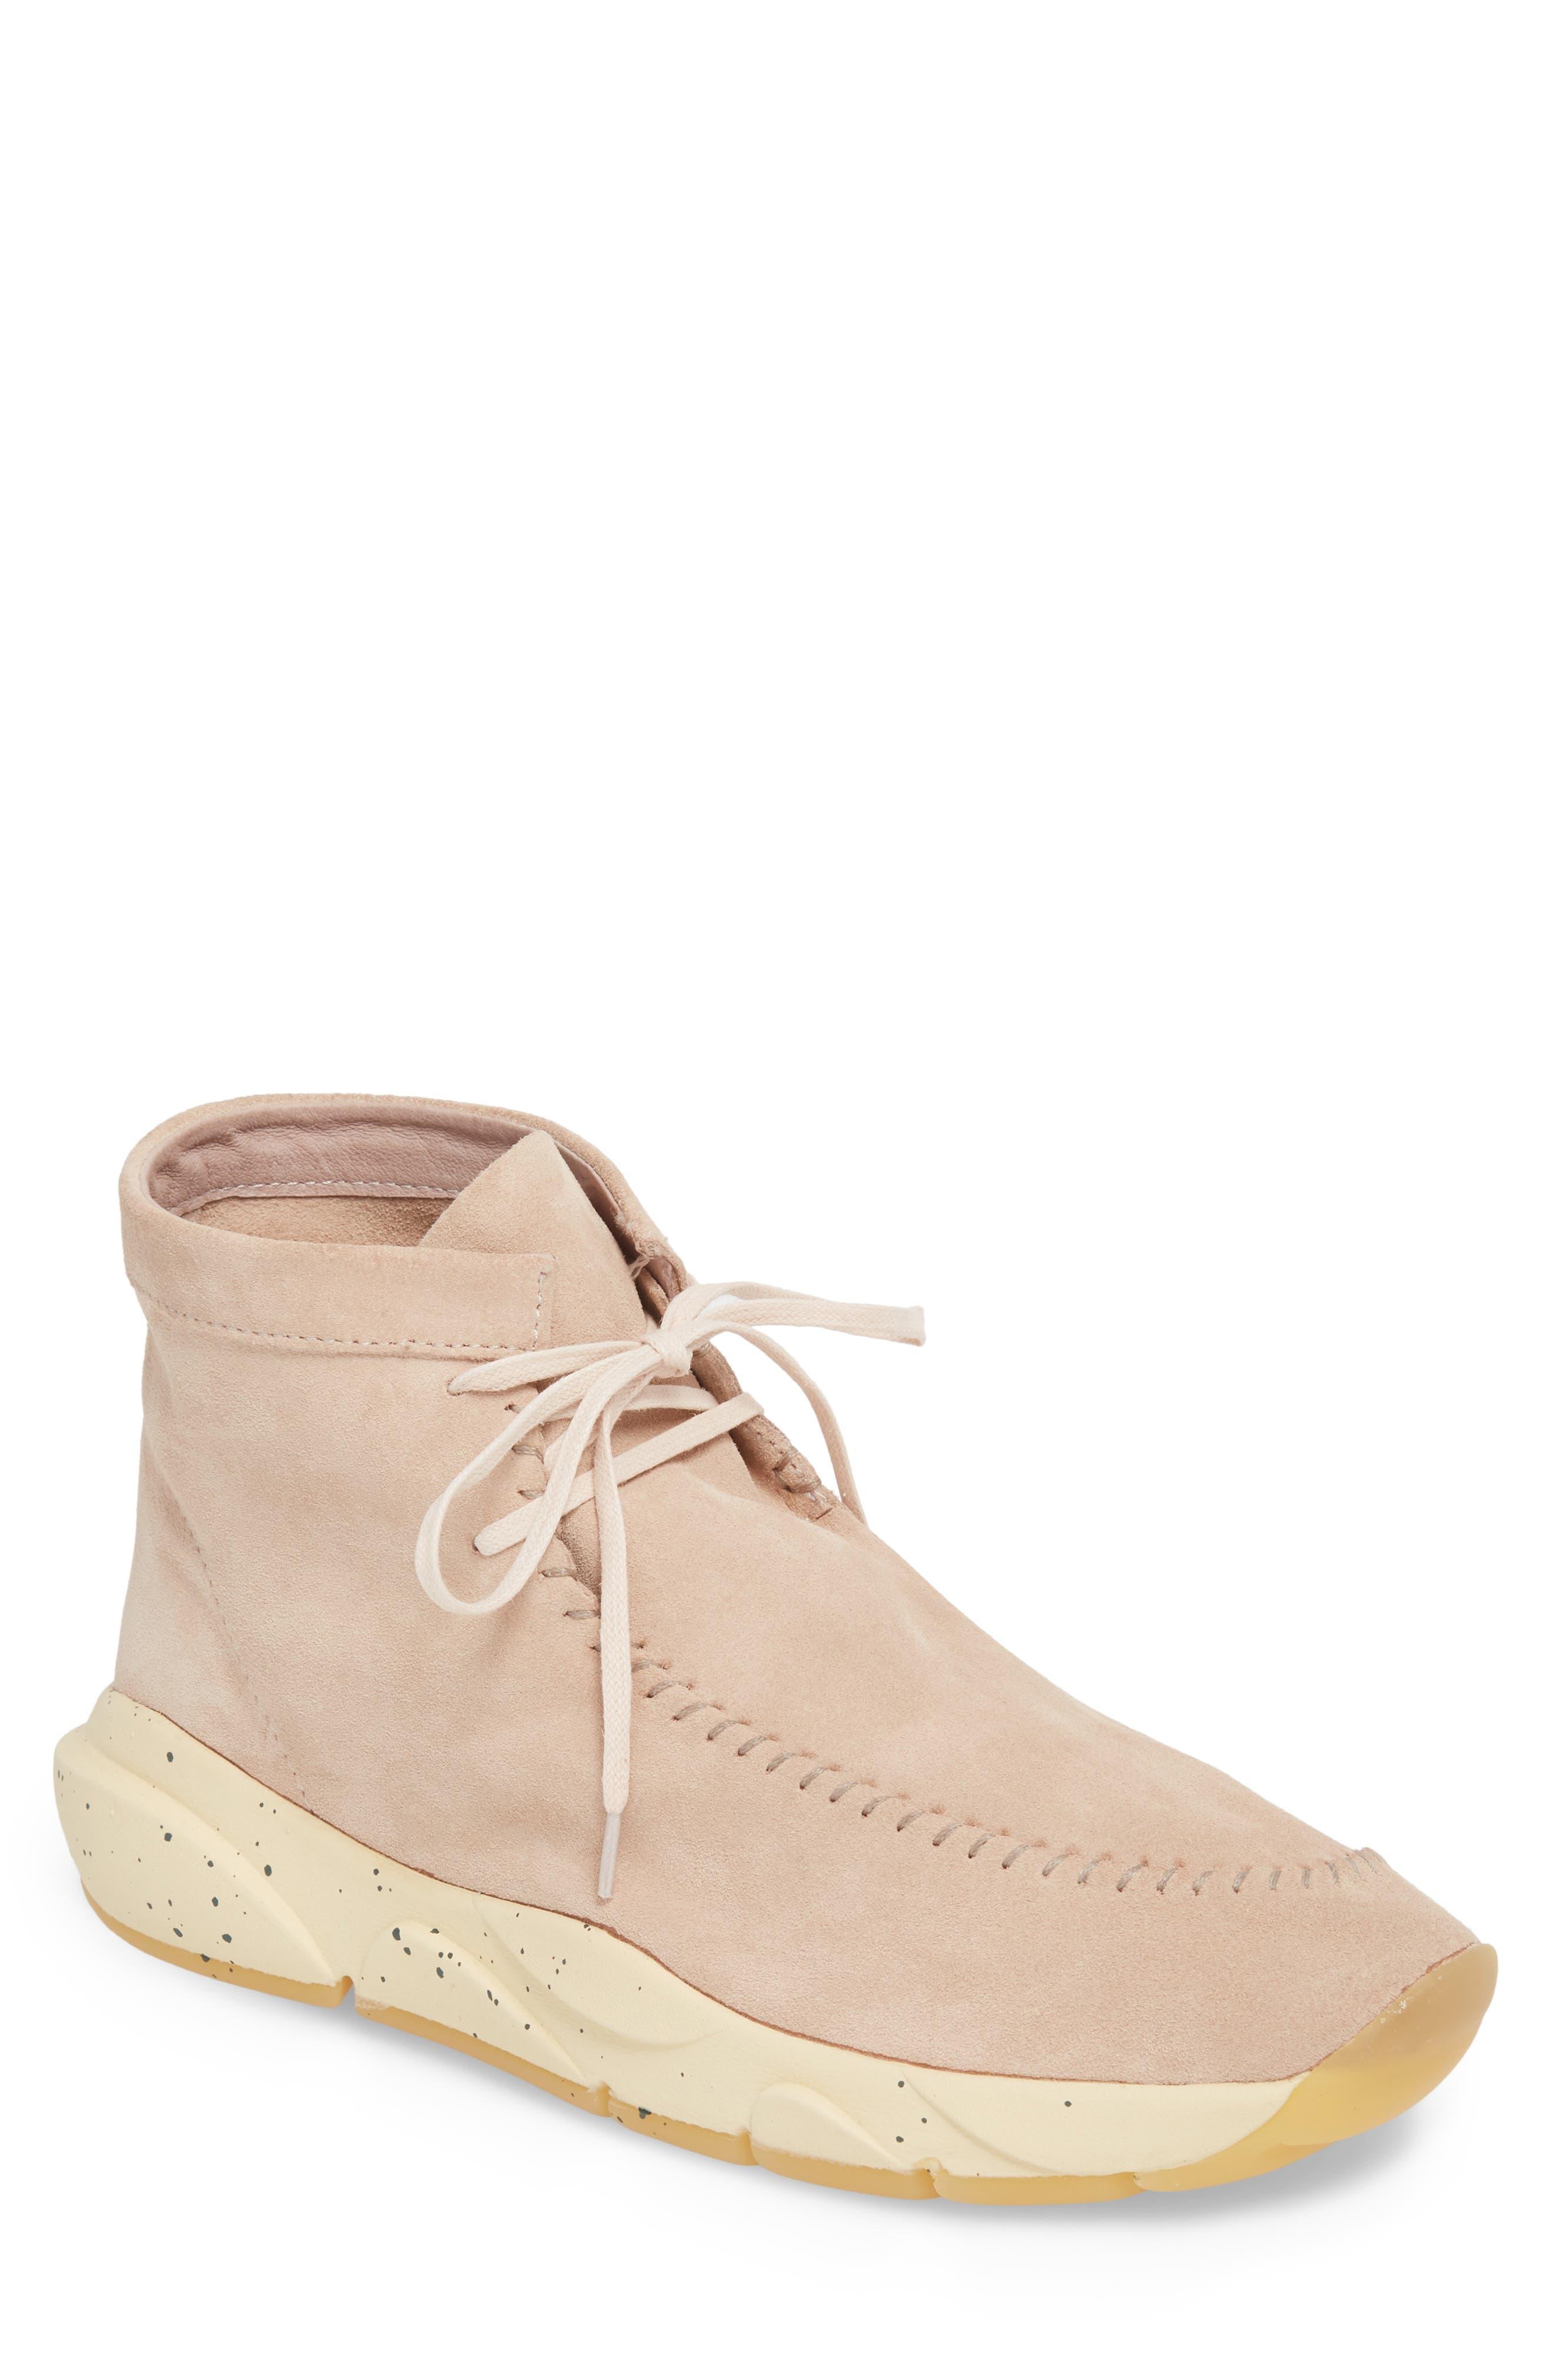 CLEAR WEATHER Castas Asymmetrical Chukka Sneaker in Rose Dust